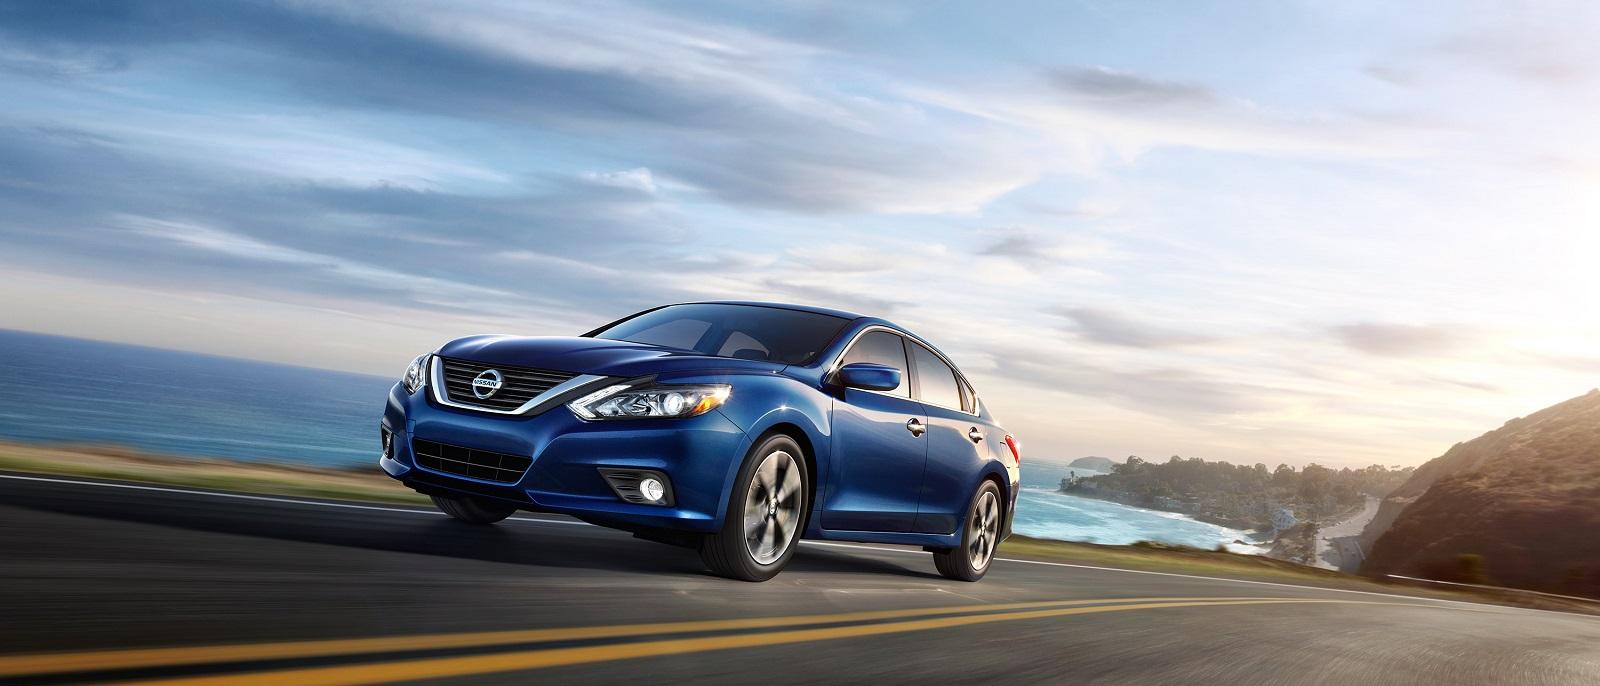 2016-nissan-altima-driving-ocean-highway-deep-pearl-blue